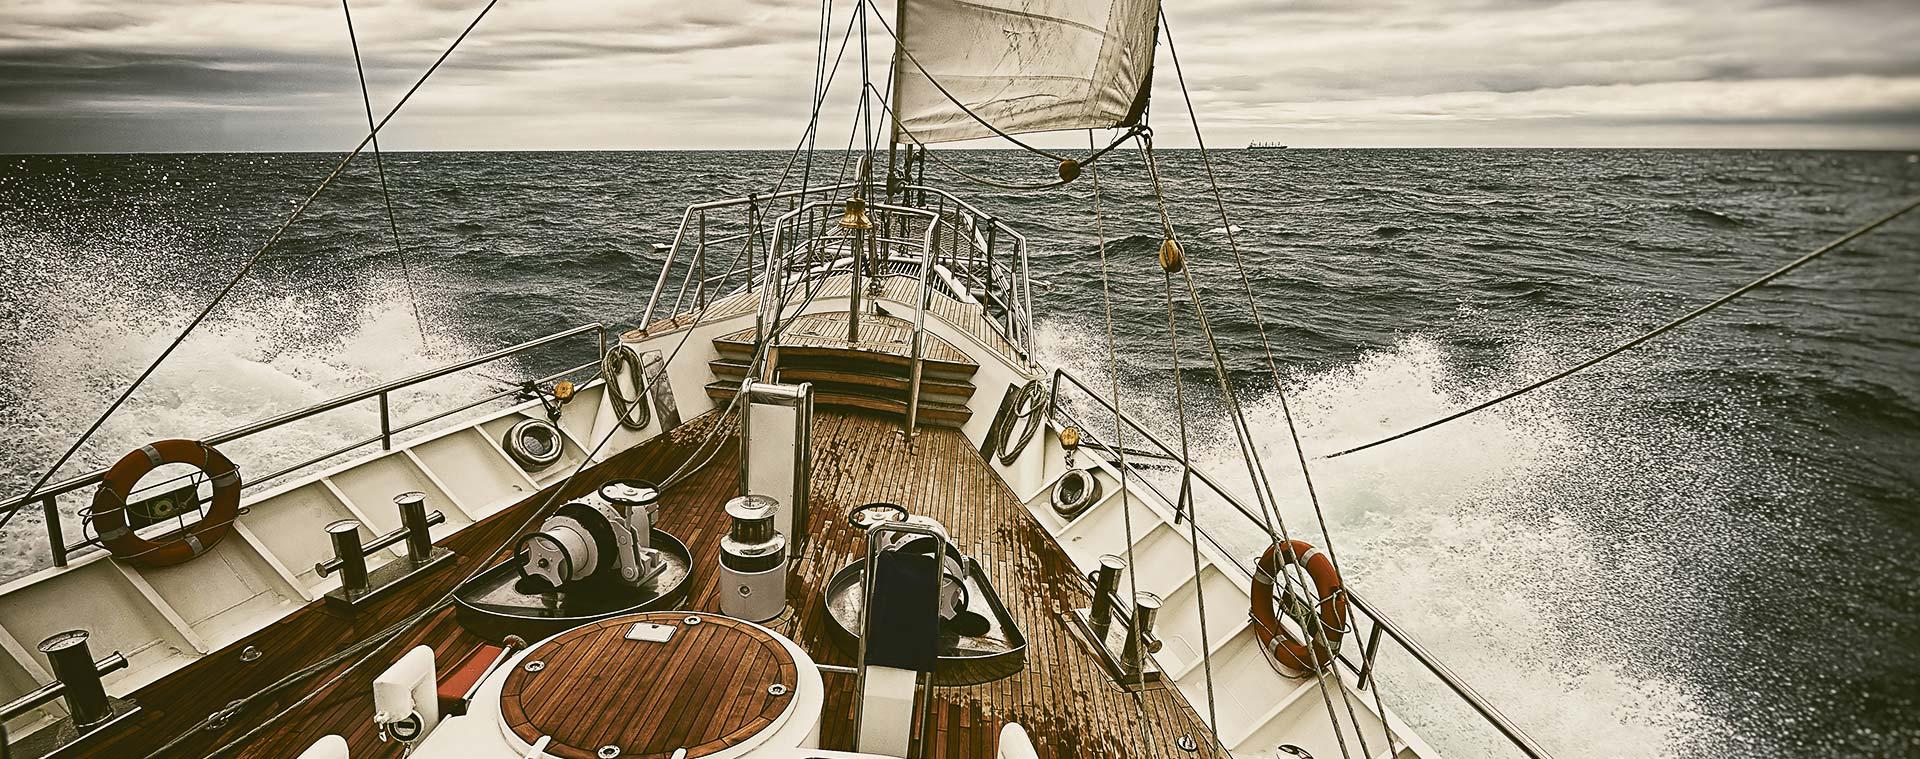 barco-2